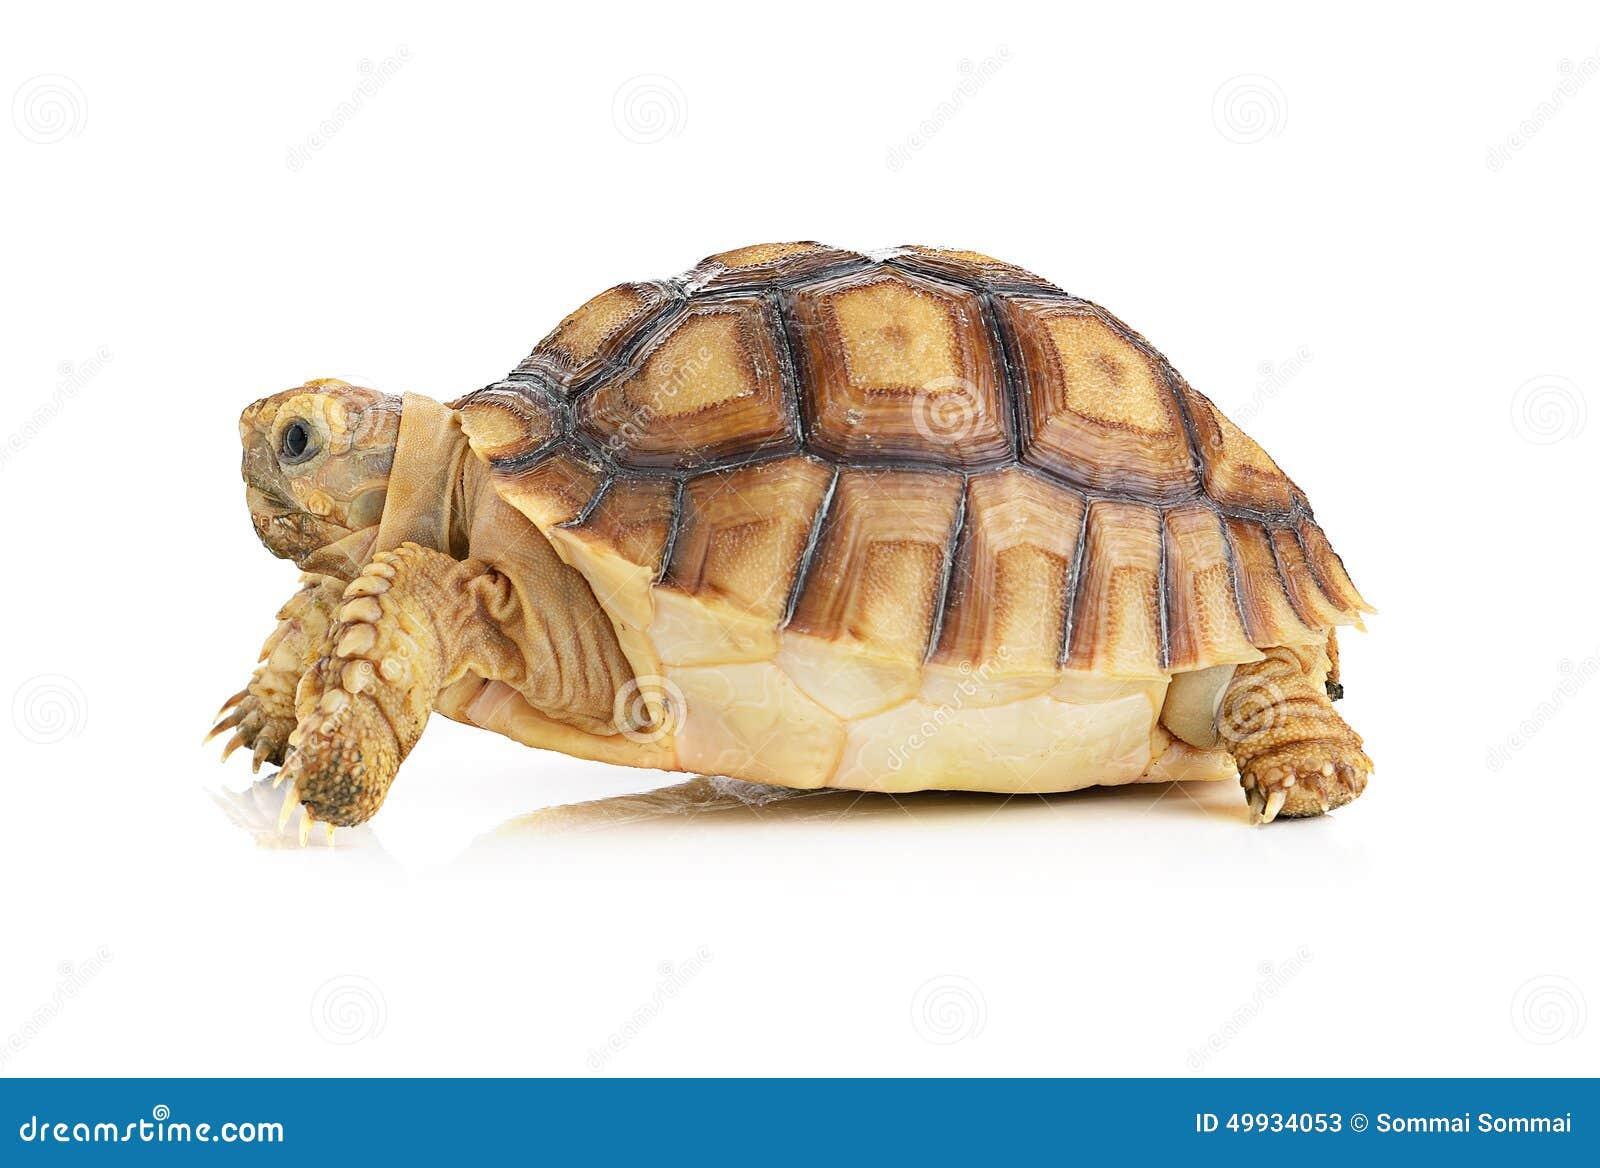 turtle white background - photo #49